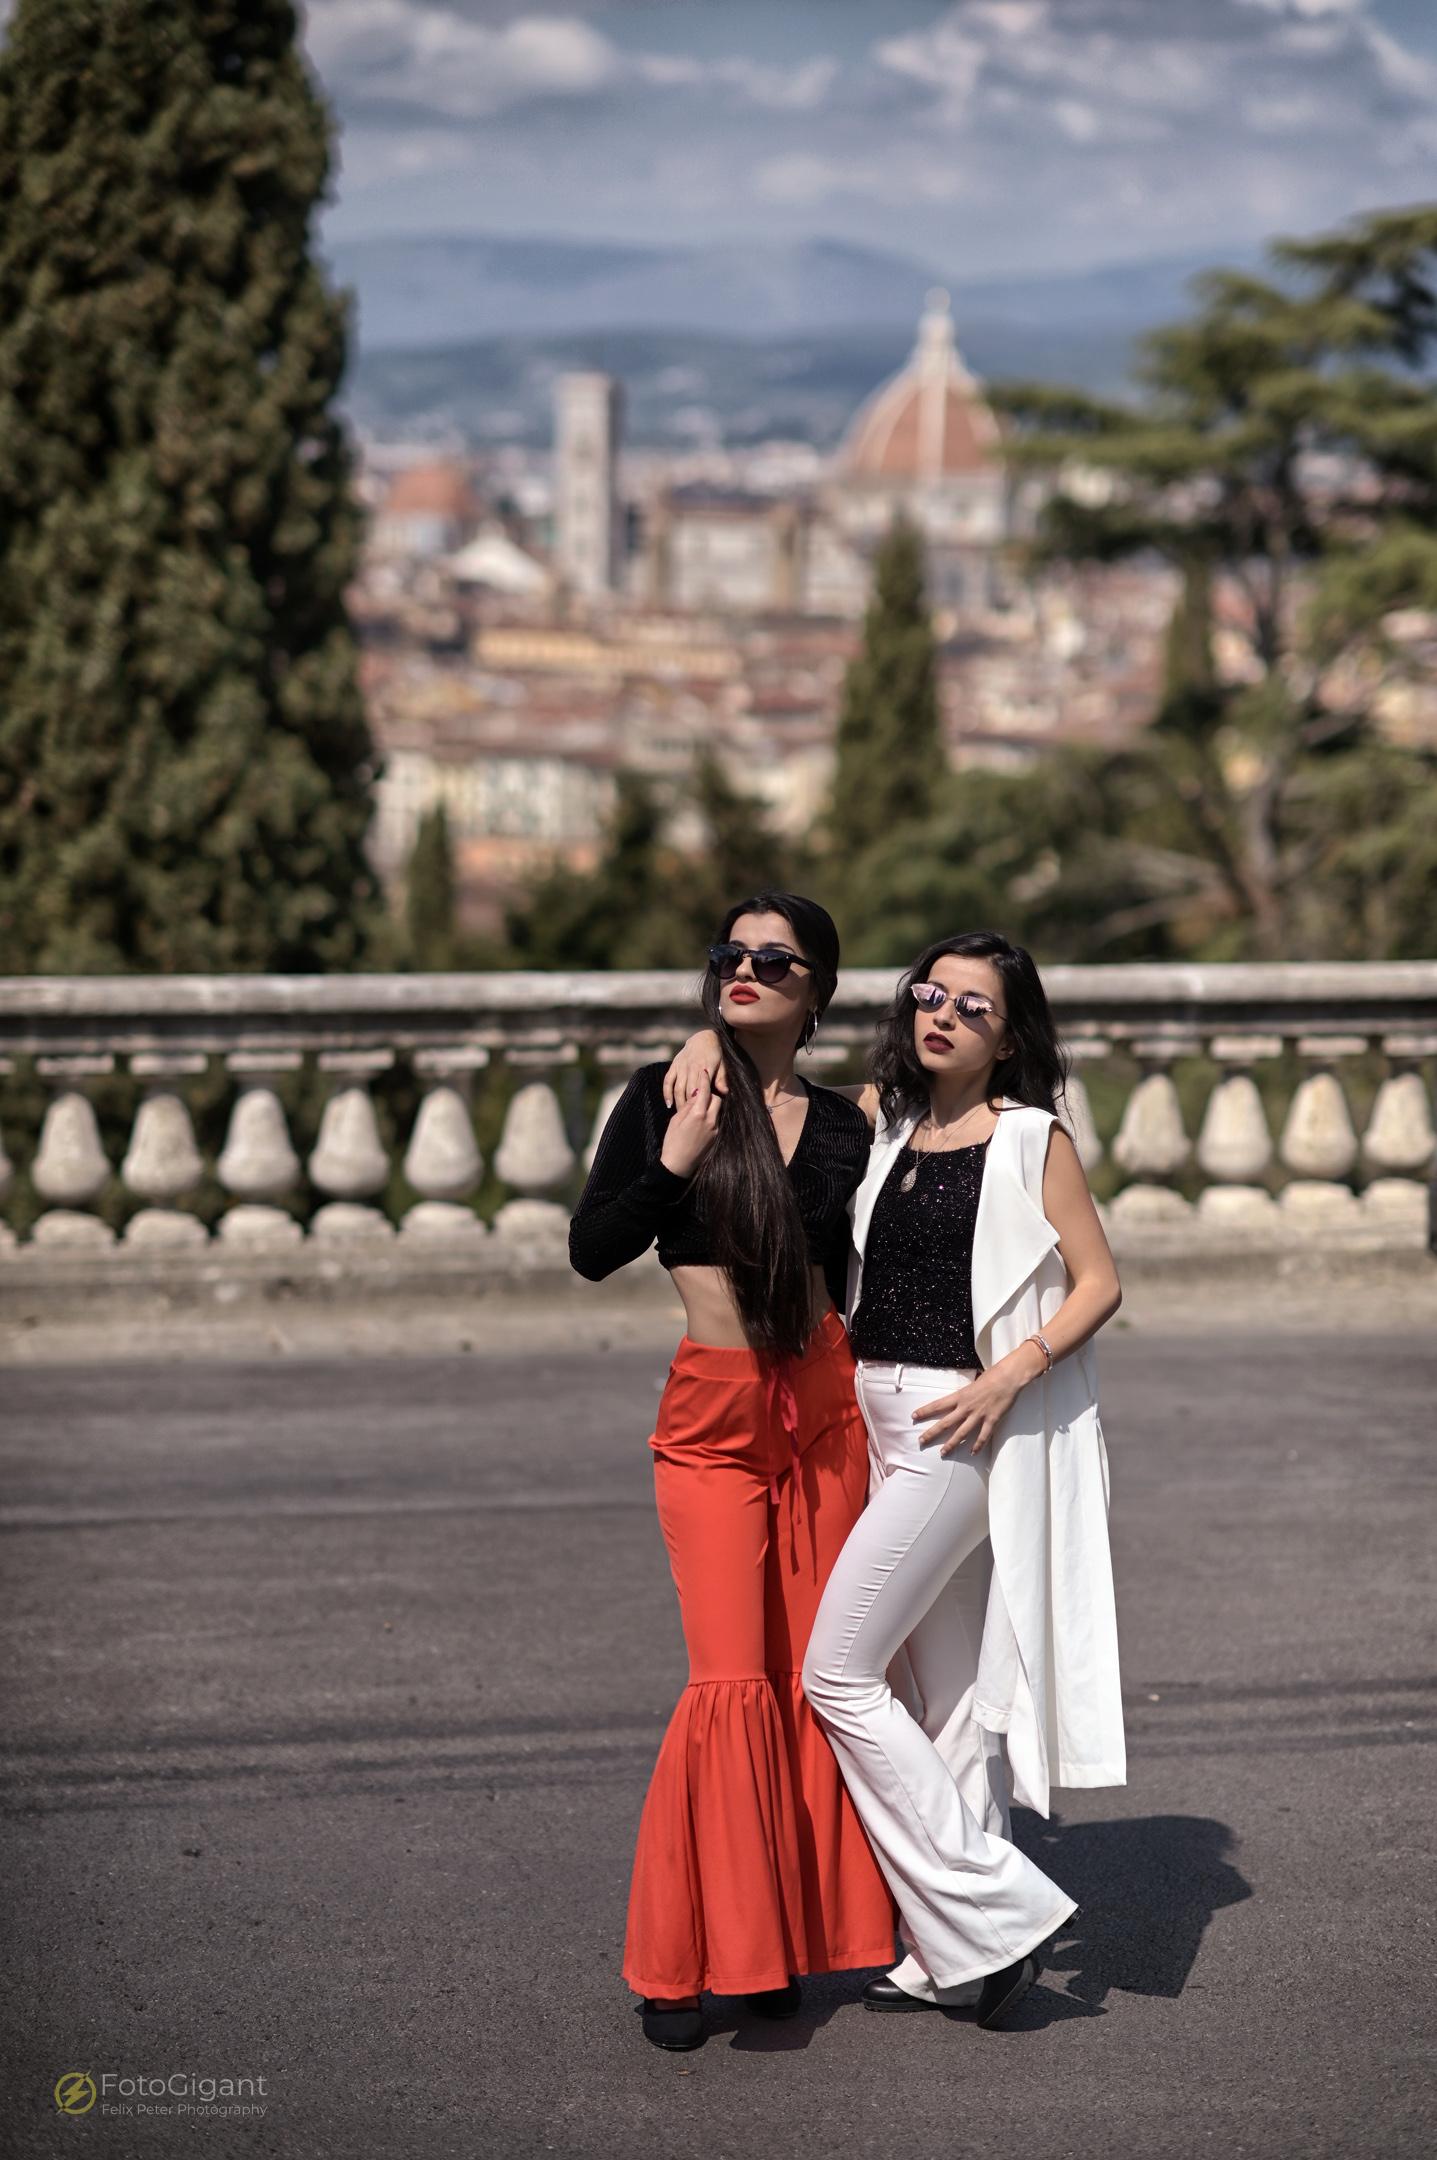 WS_2019_Firenze_Day1_0959_edit1_fb.jpg